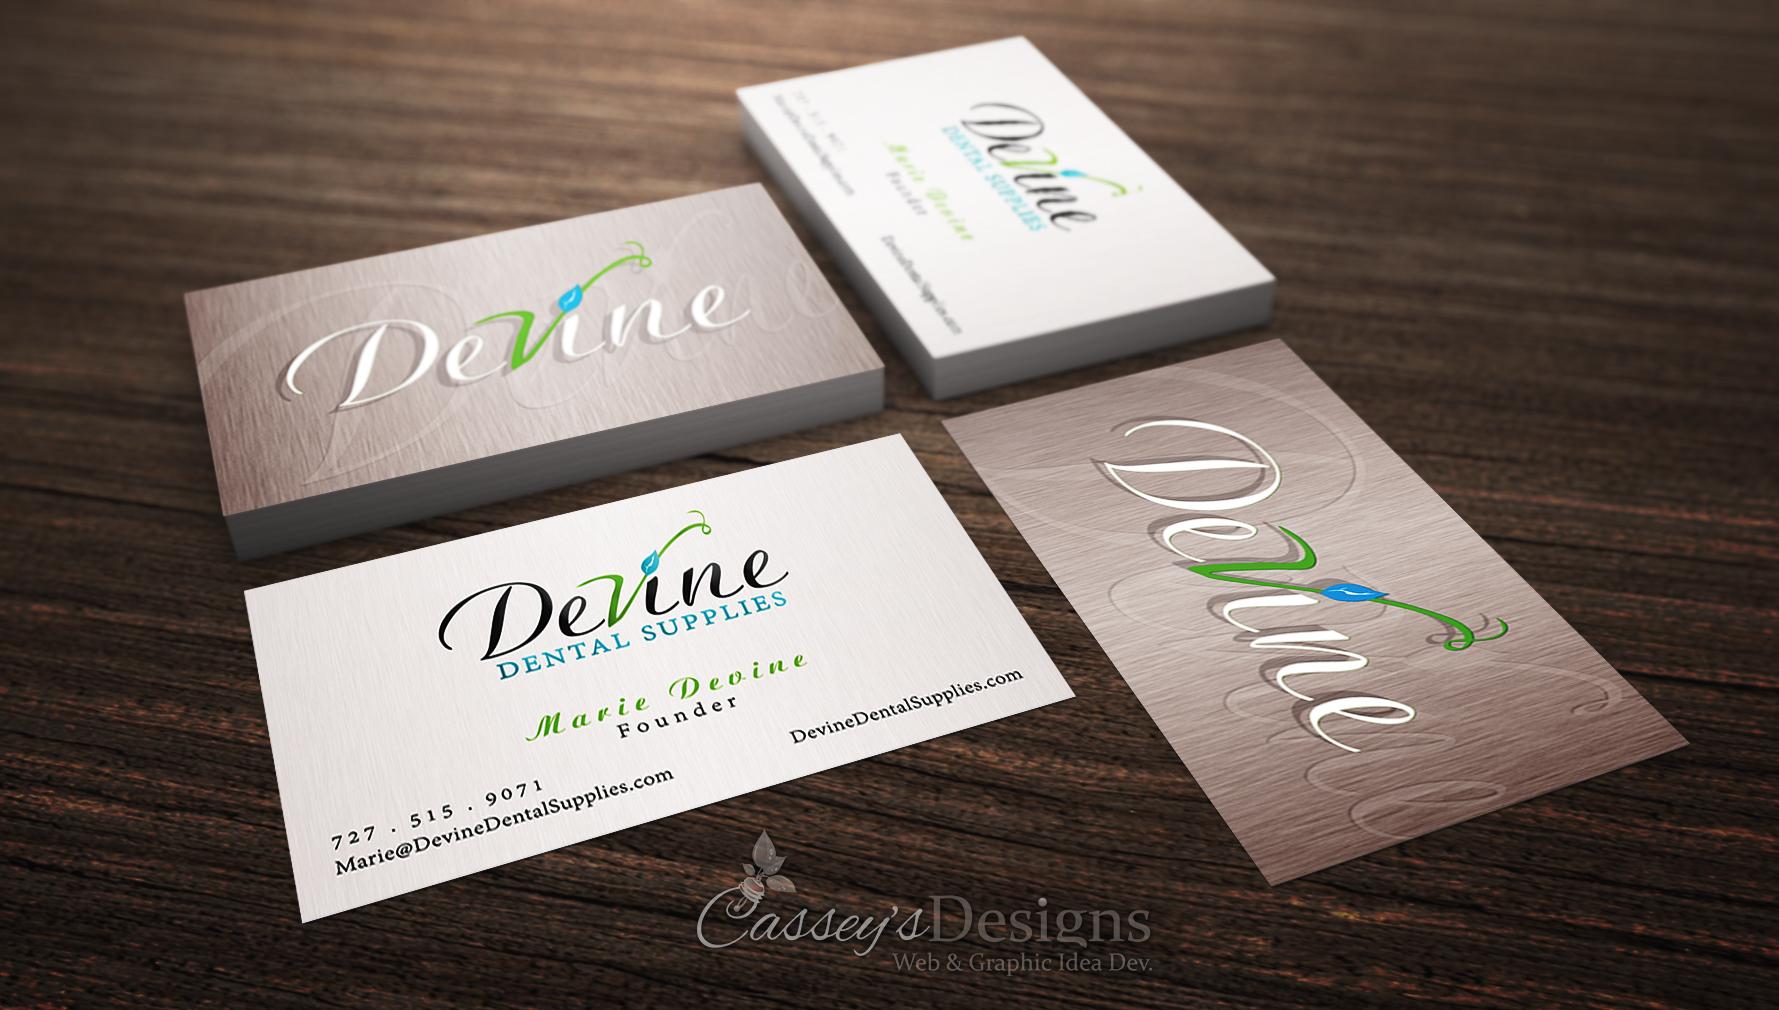 Logo gallery casseys designs devine dental supplies colourmoves